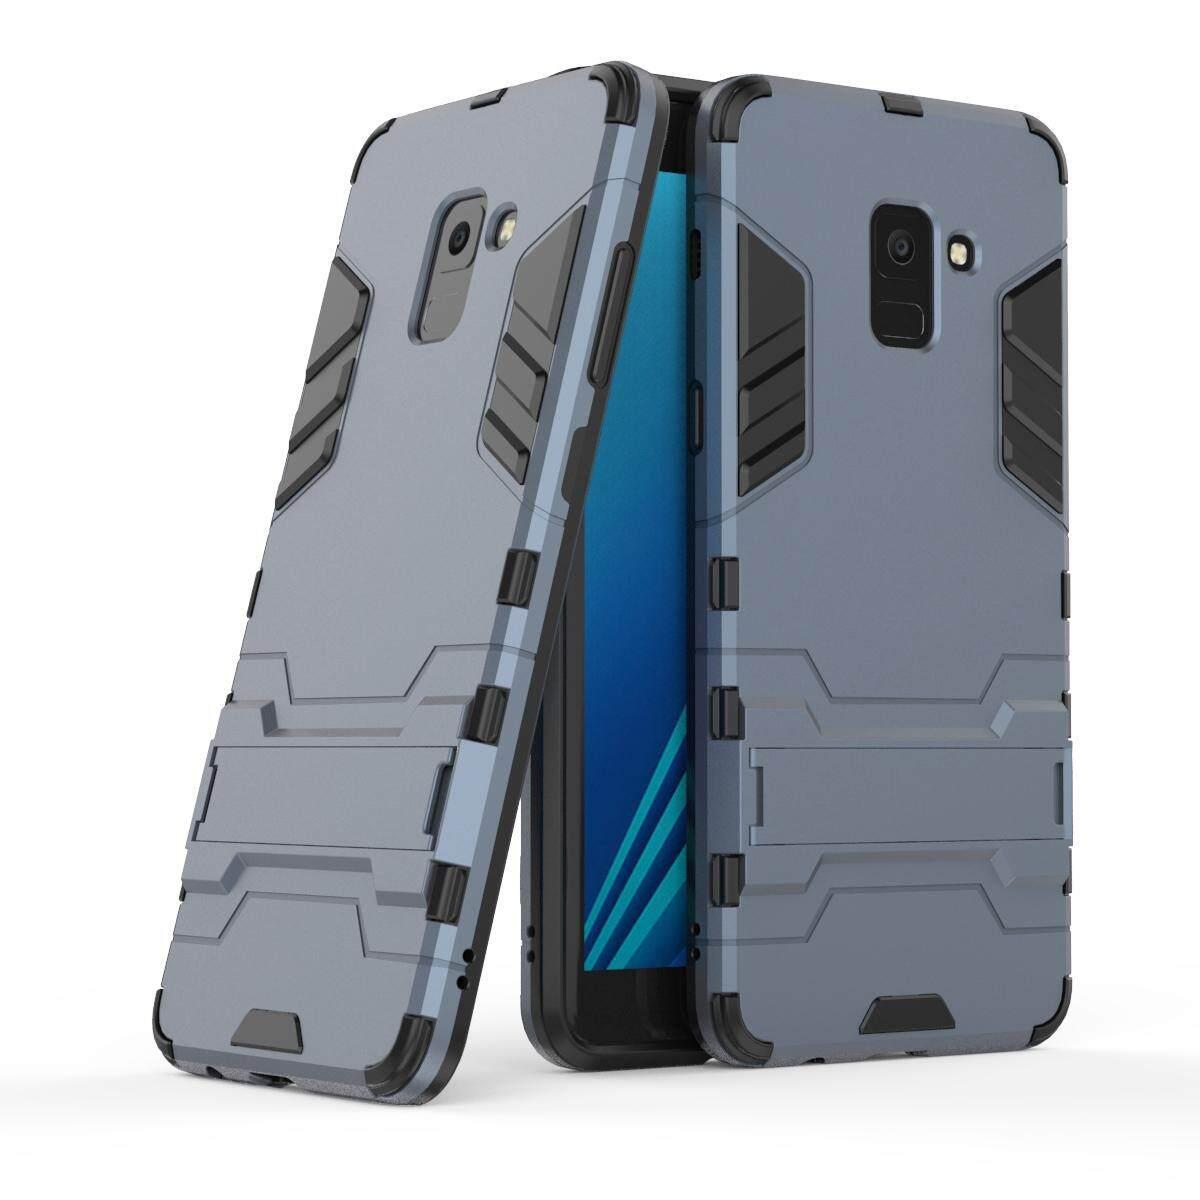 Samsung Galaksi A8 2018 Plus Case, bulan Case 2 Dalam 1 Hibrida Kasar Pelindung Case